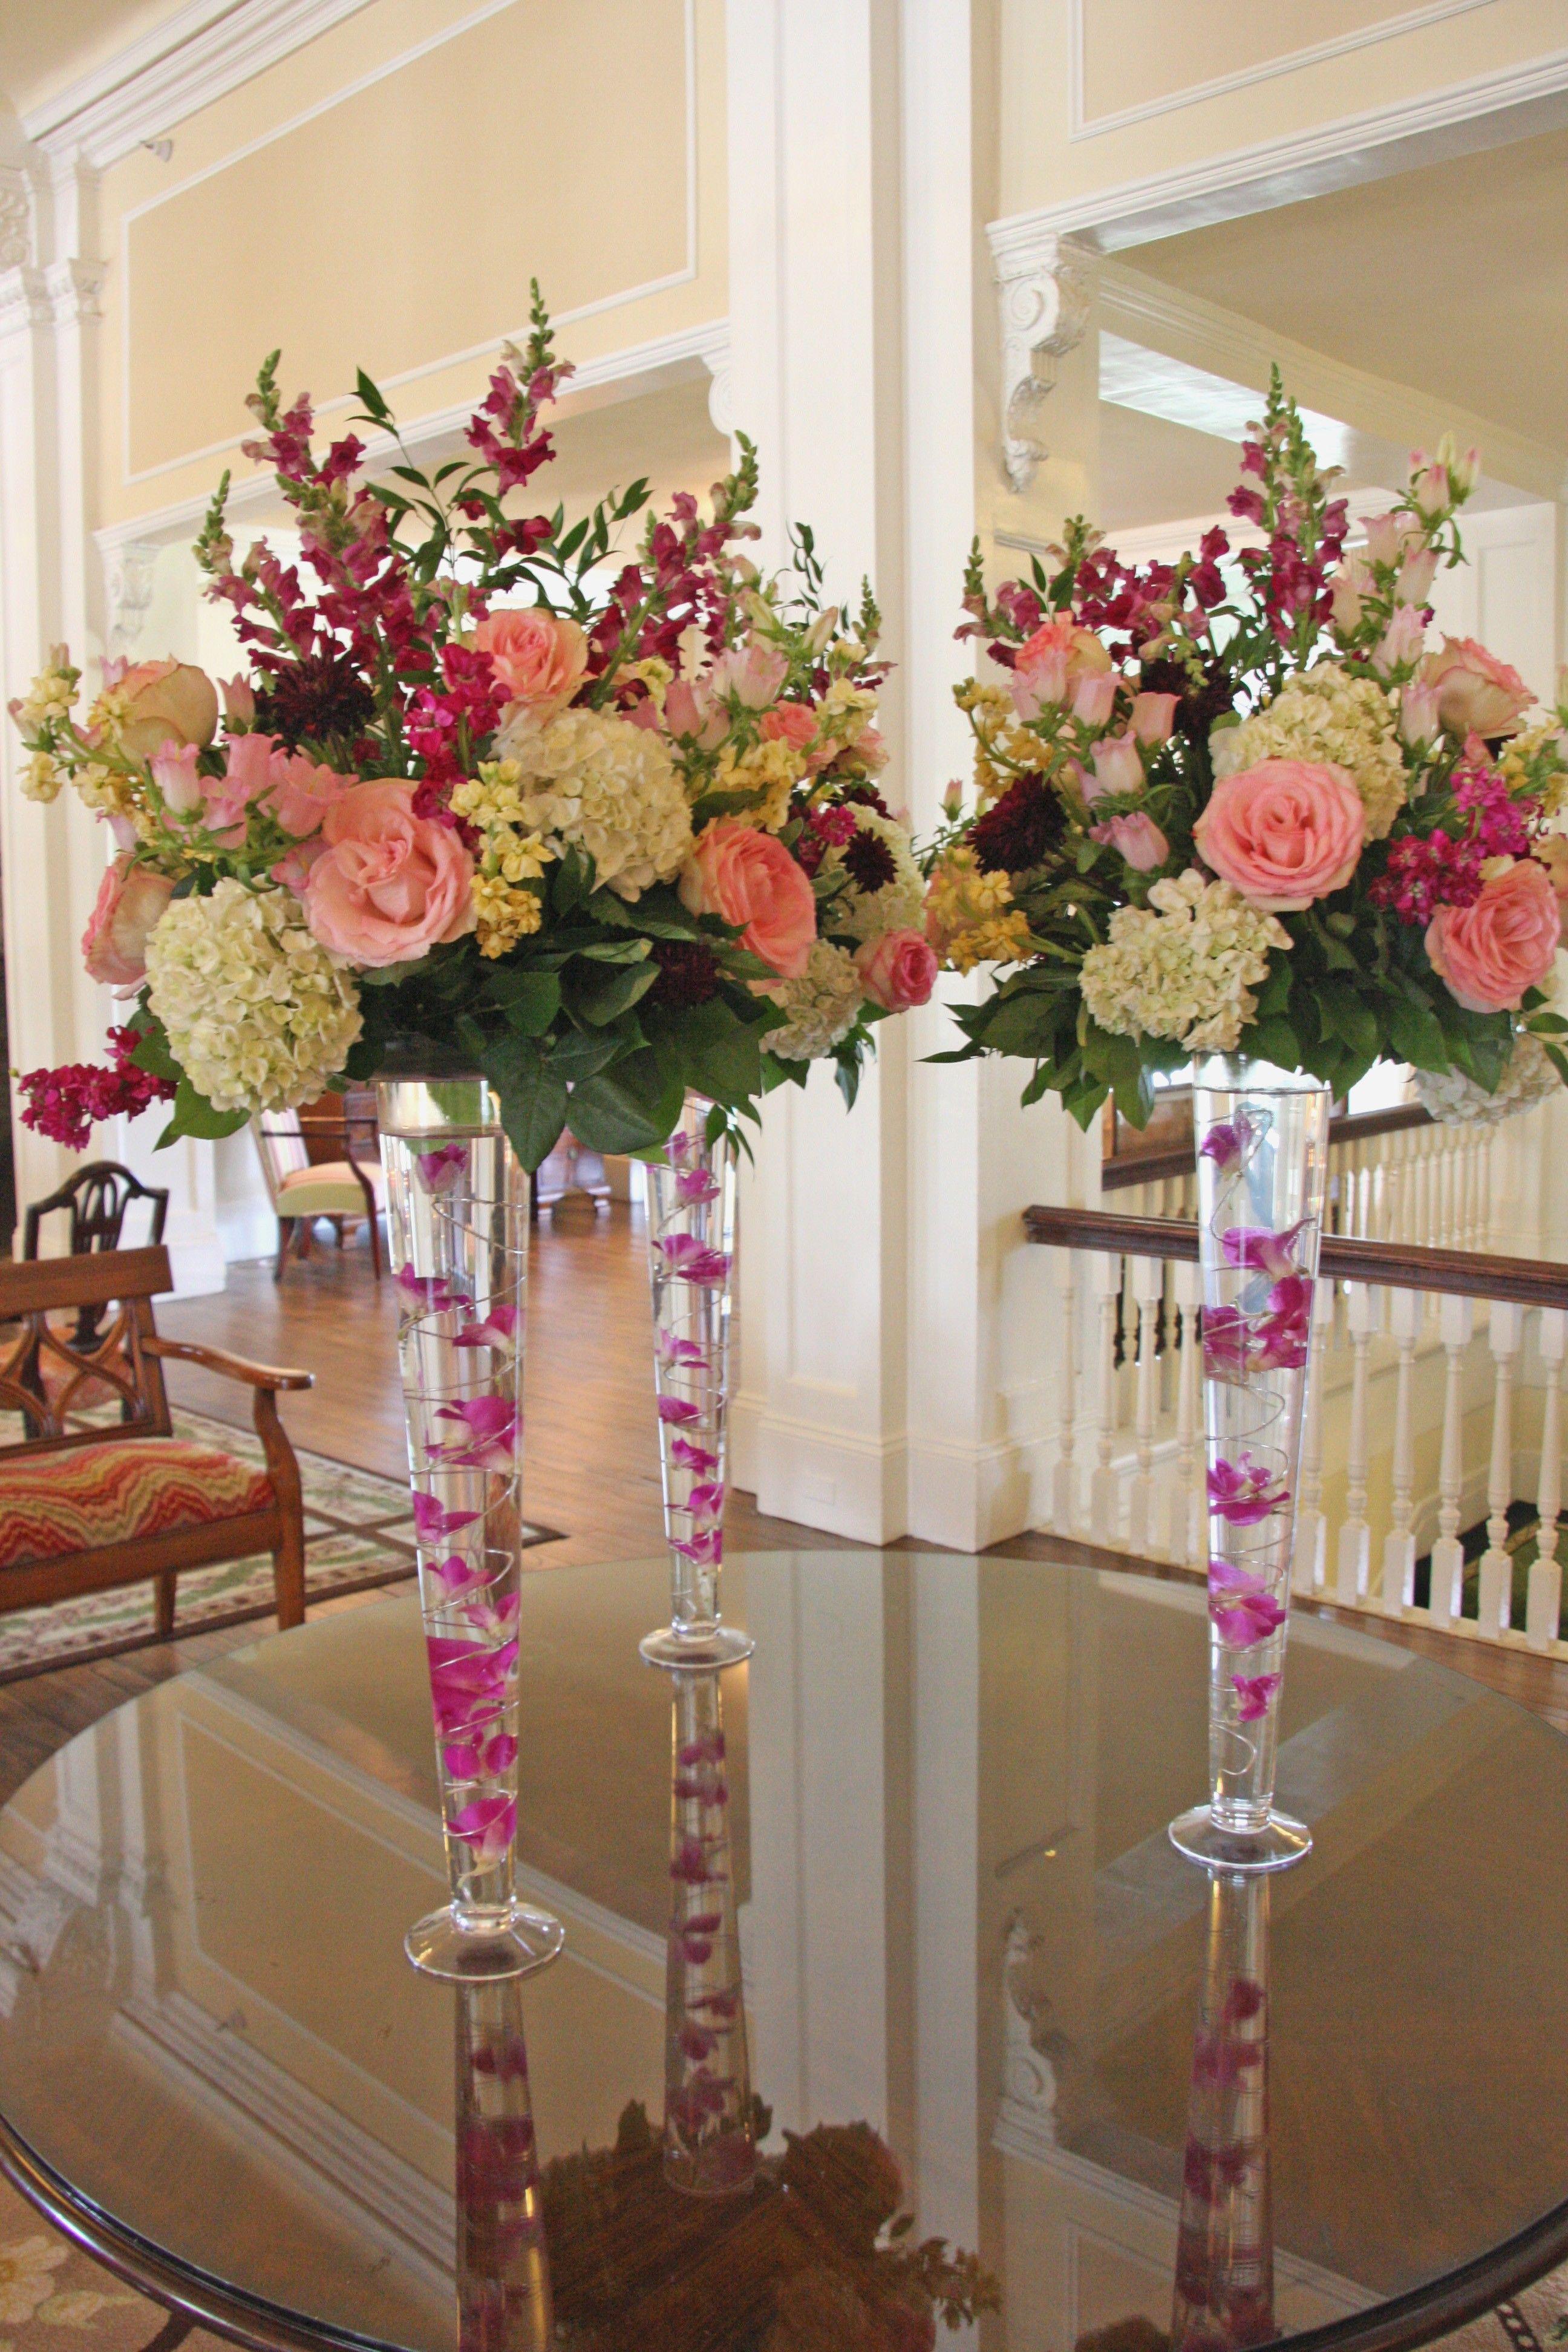 Fresh Cut Flowers Interior Enchanting S Home Decor Gorgeous Pretty F Flower Arrangements Kitchen Utensils Beautiful